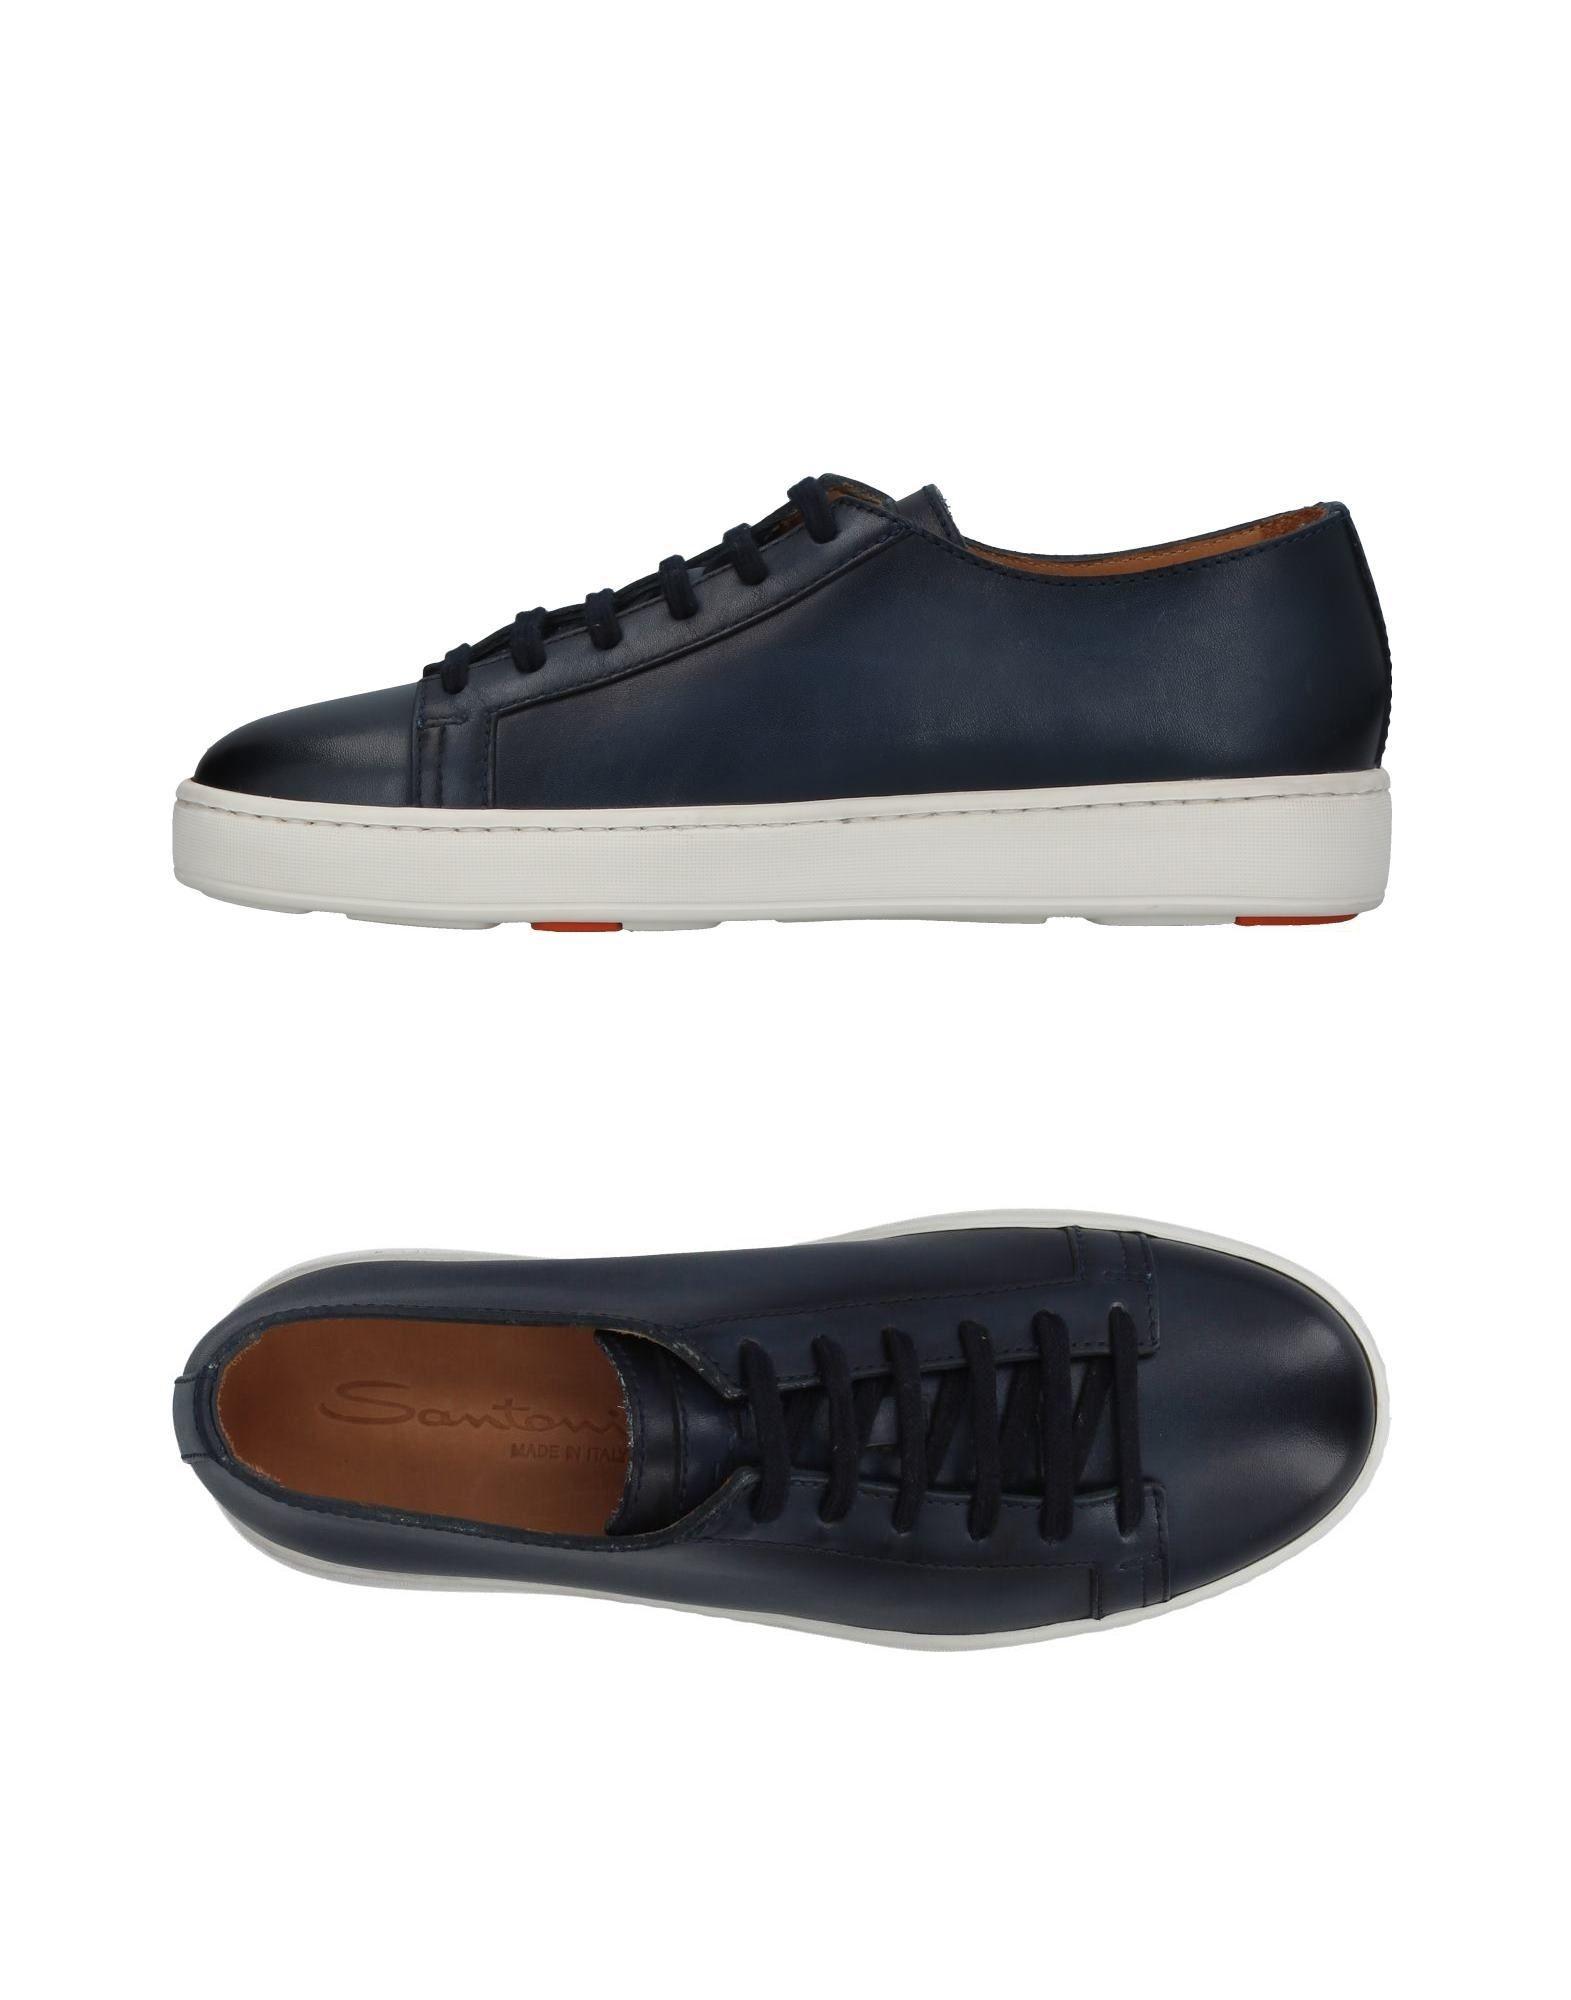 brooks низкие кеды и кроссовки SANTONI Низкие кеды и кроссовки